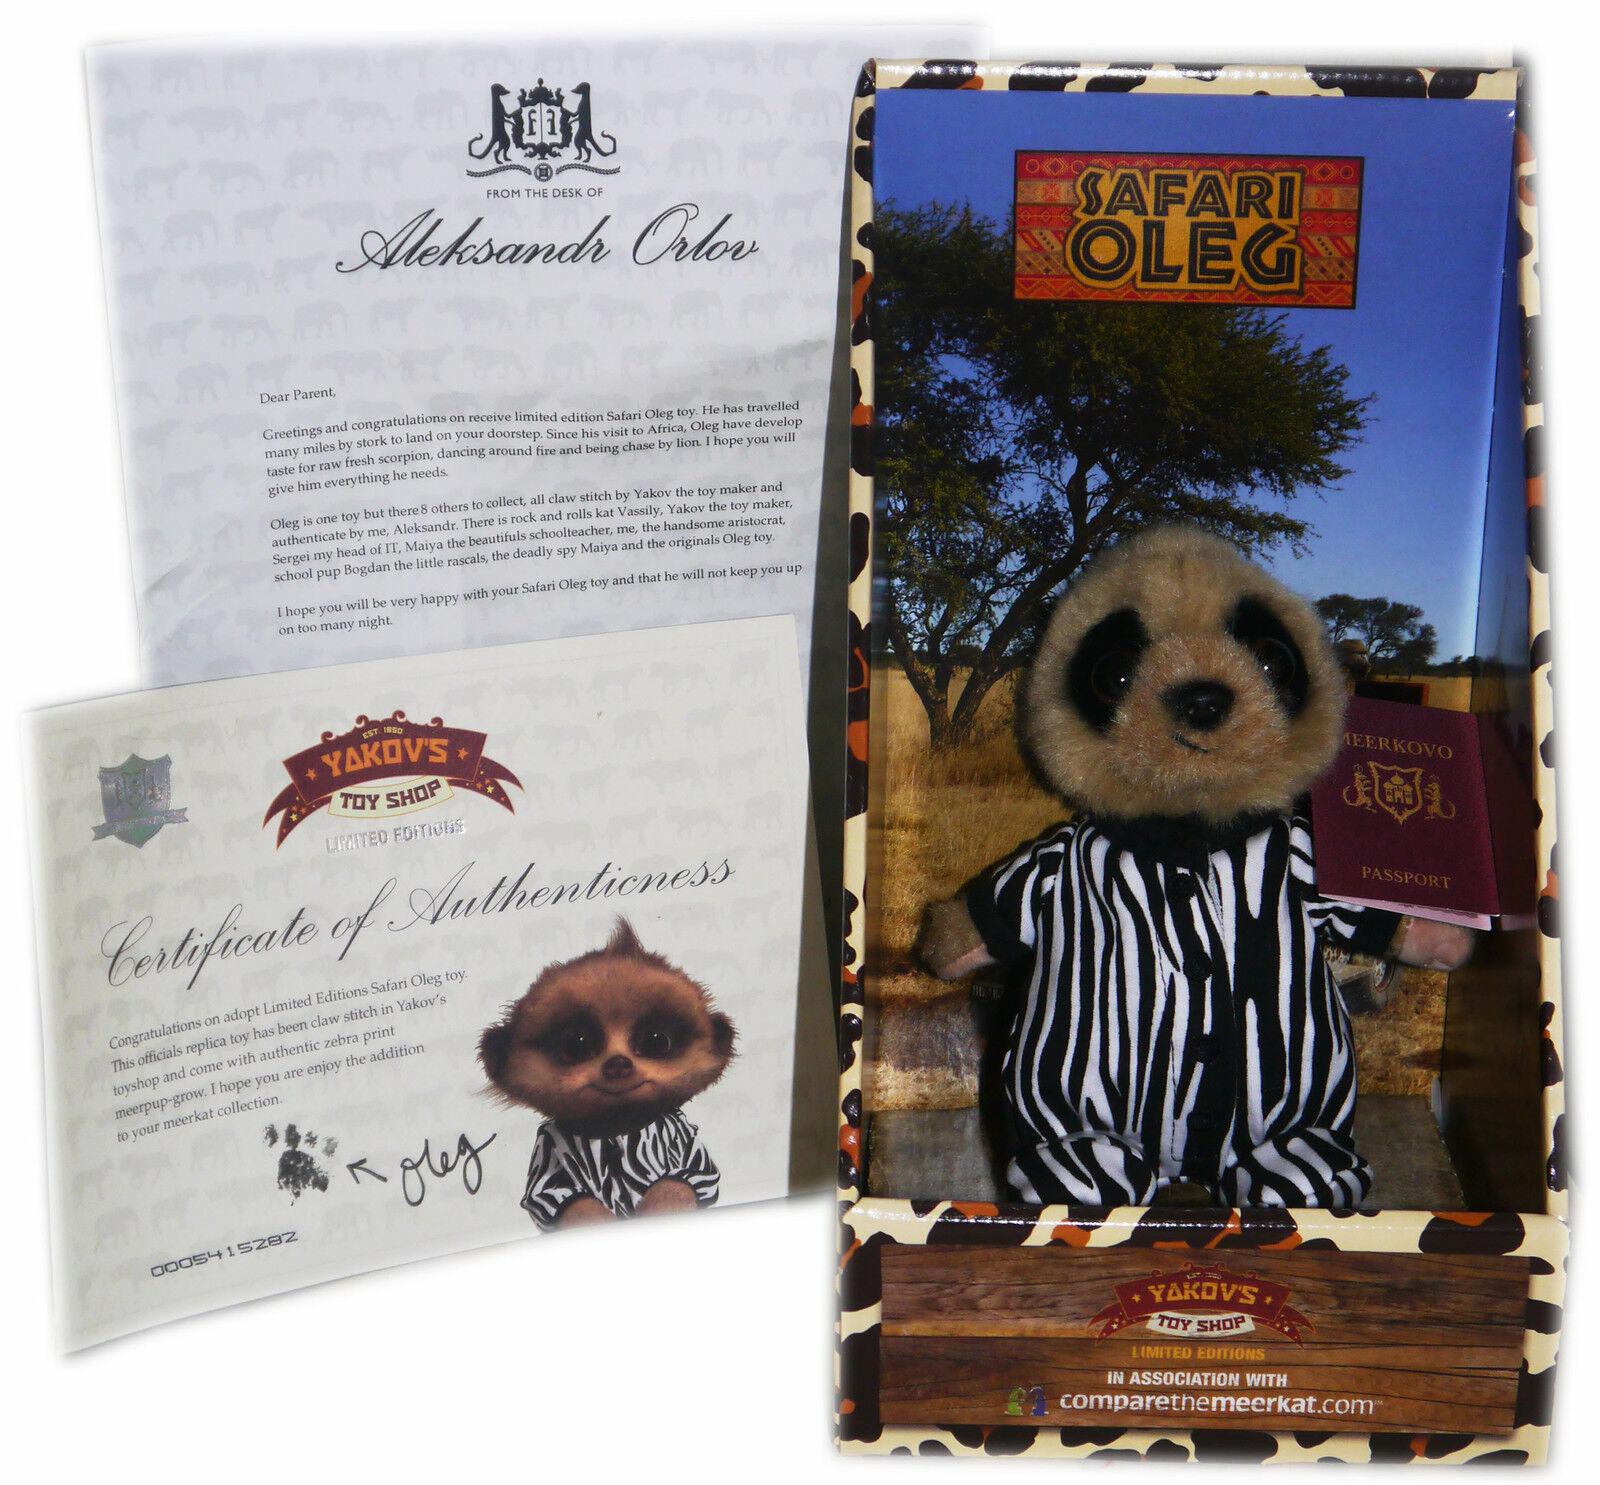 Meerkat Limited Edition Safari Baby Oleg with Certificate (COA) Letter & Box